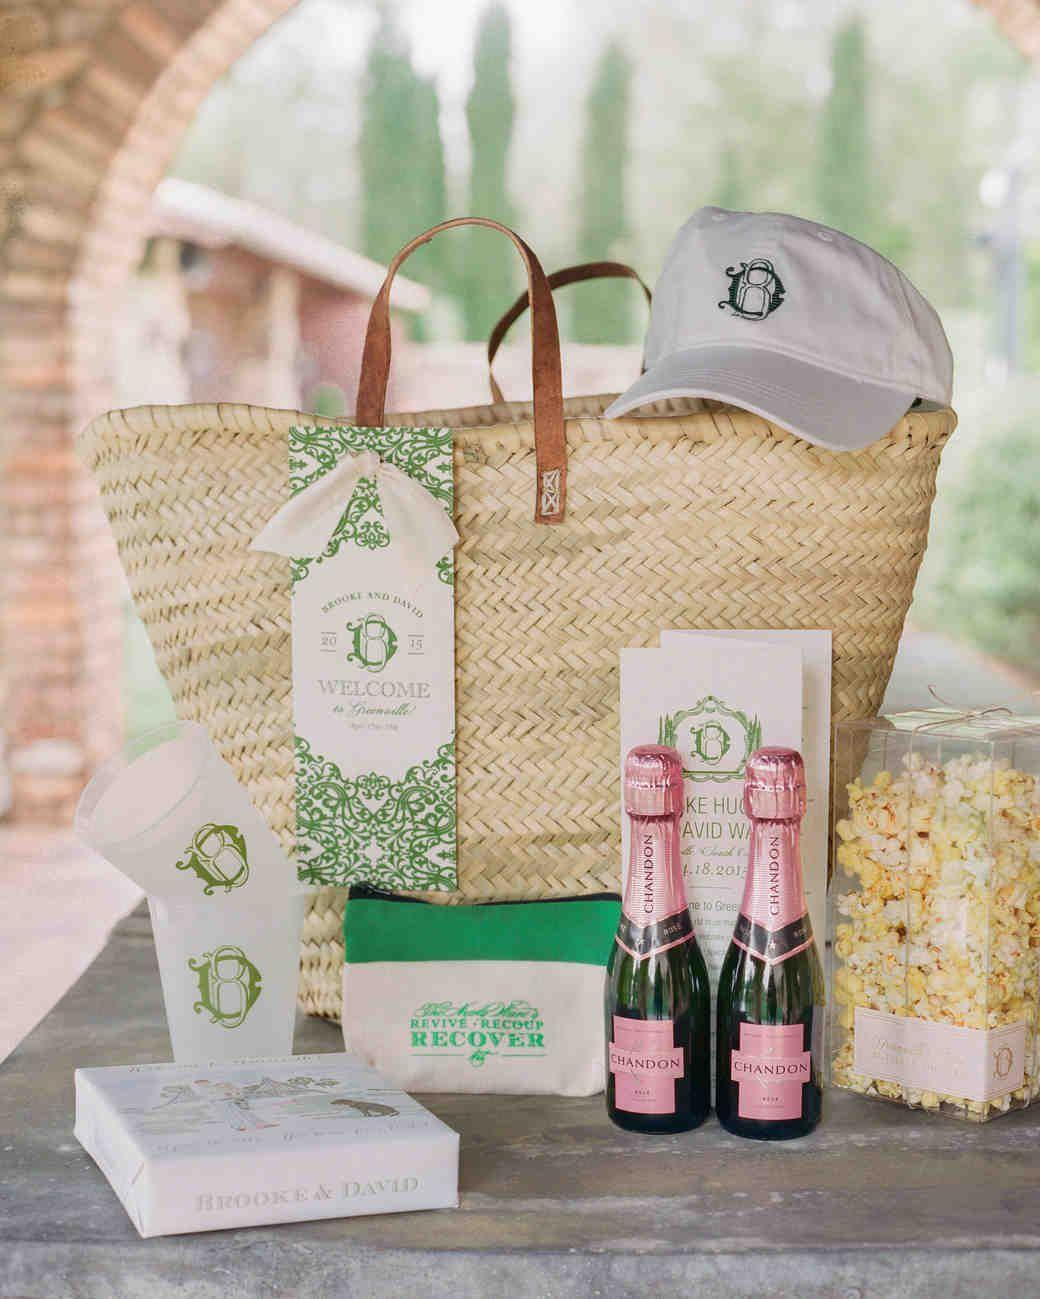 Destination Wedding Gift Ideas: An Elegant Southern Wedding At Home